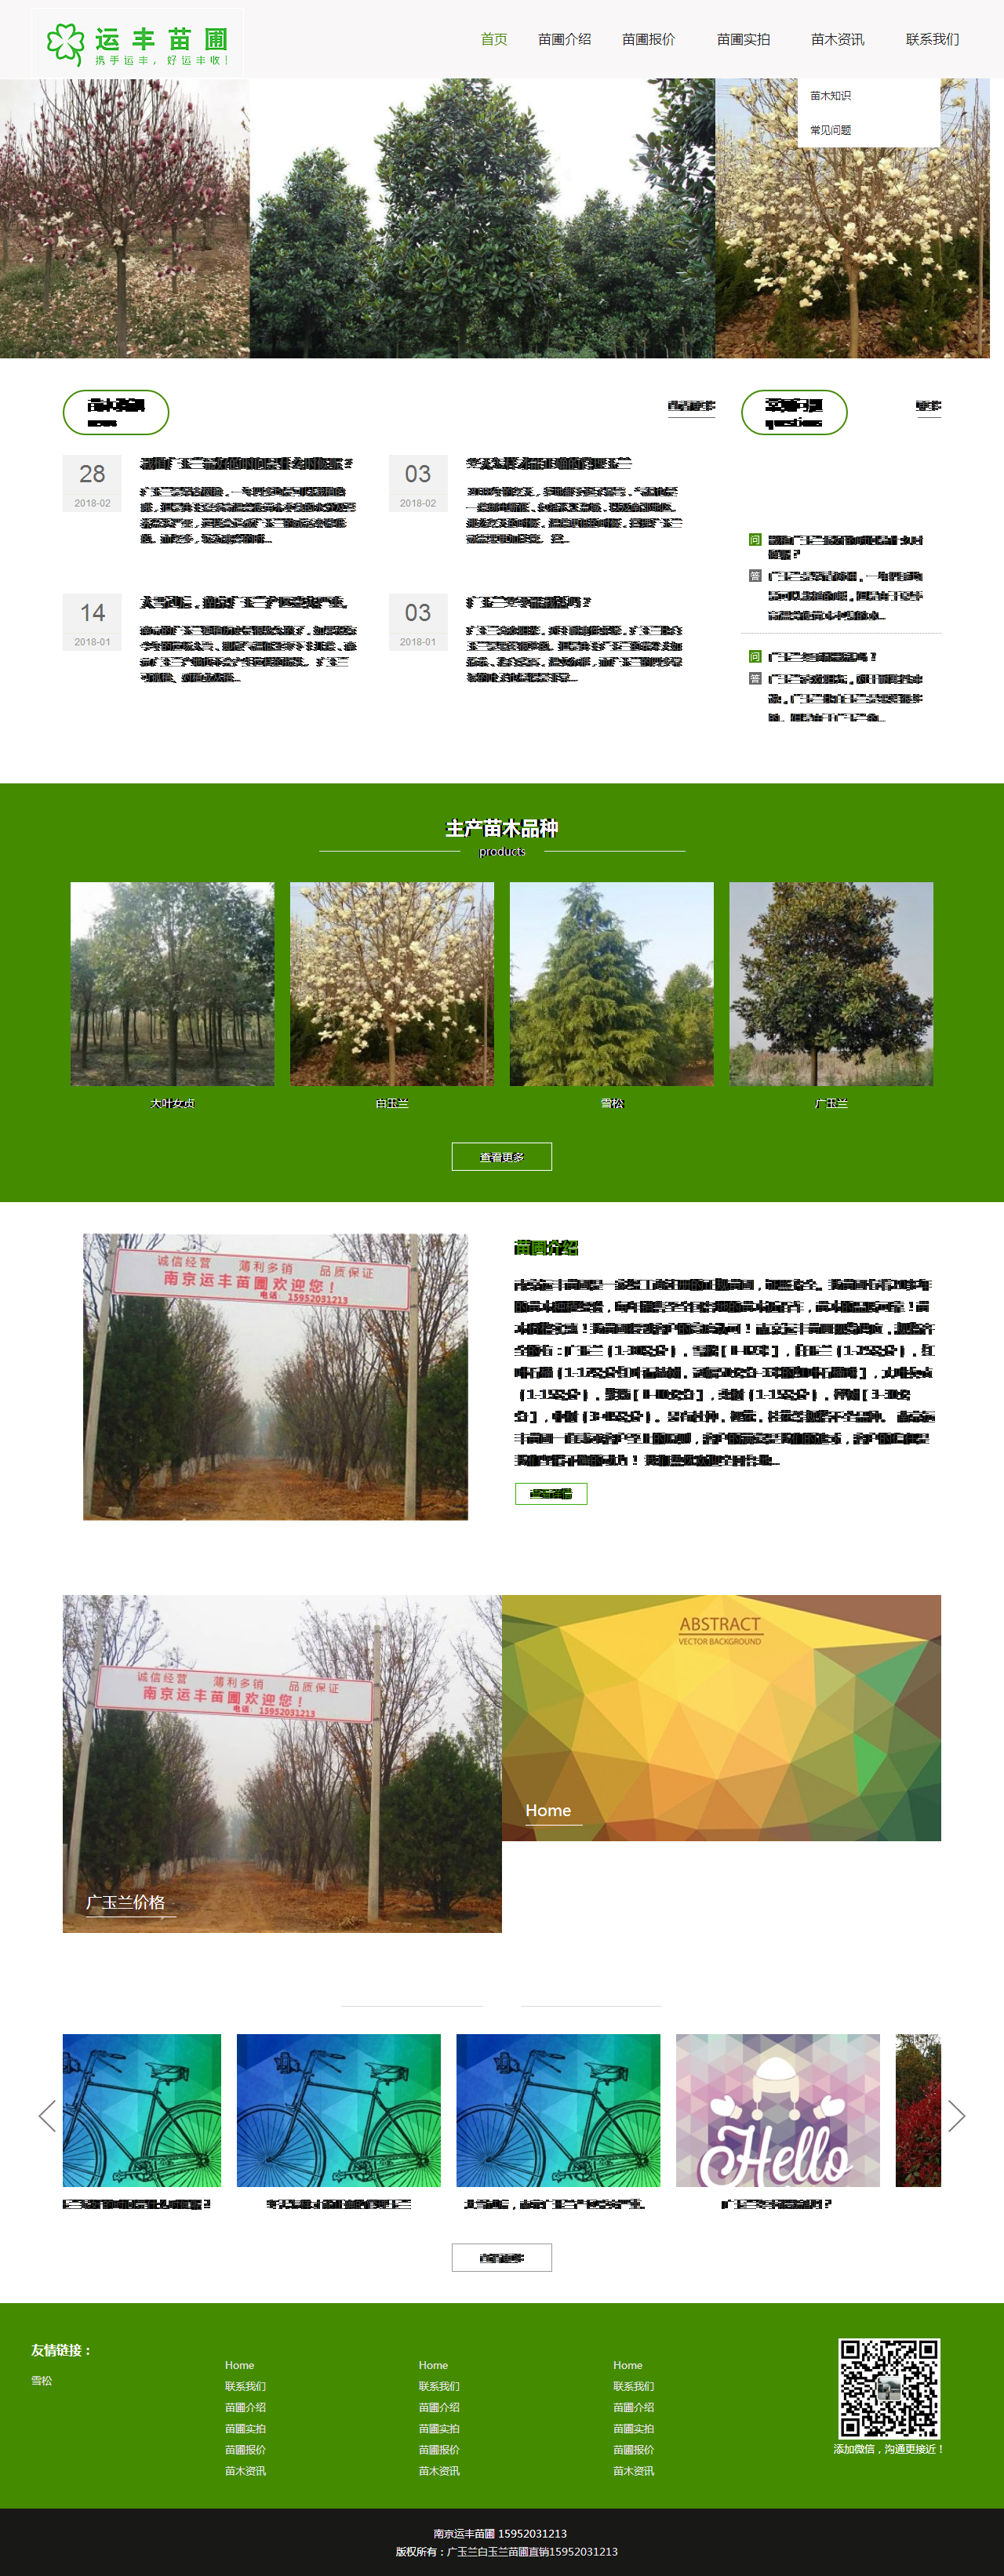 X2【主题猫官方】-V1.1.1—自适应wordpress企业主题,公司网站模板,企业模板,企业网站模板